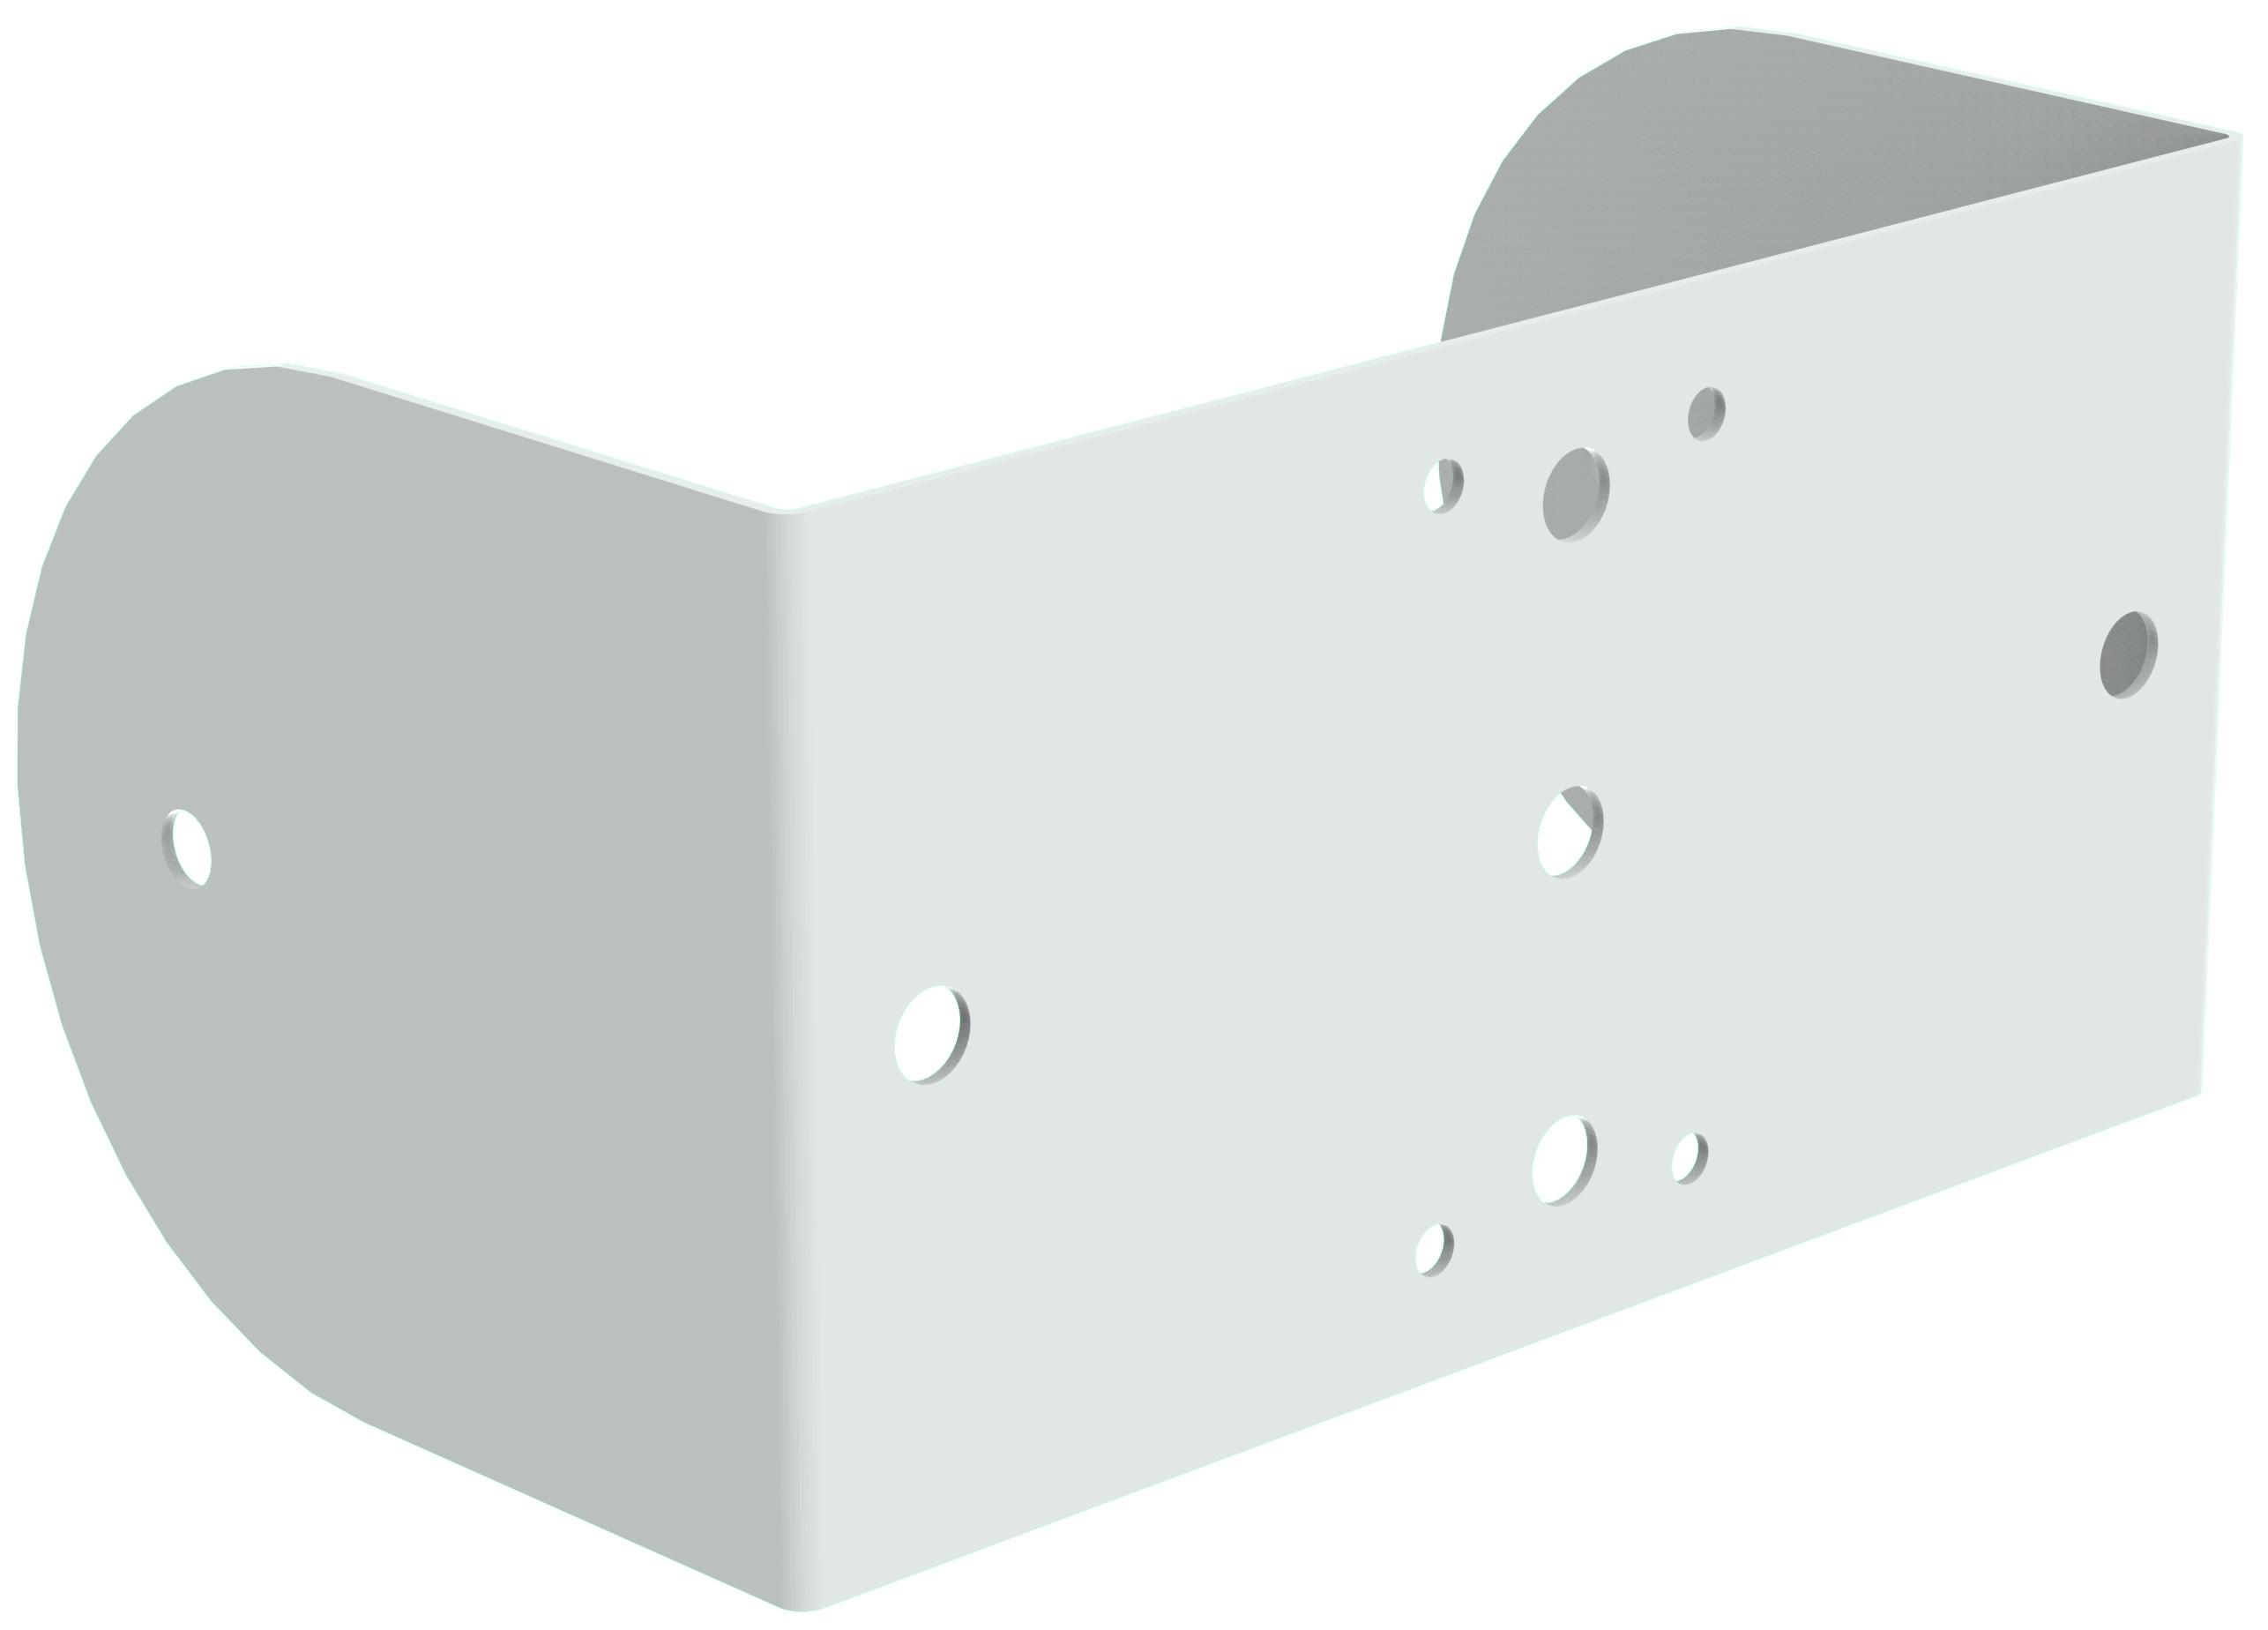 Wall/Ceiling Yoke in White for MX8-W Loudspeaker